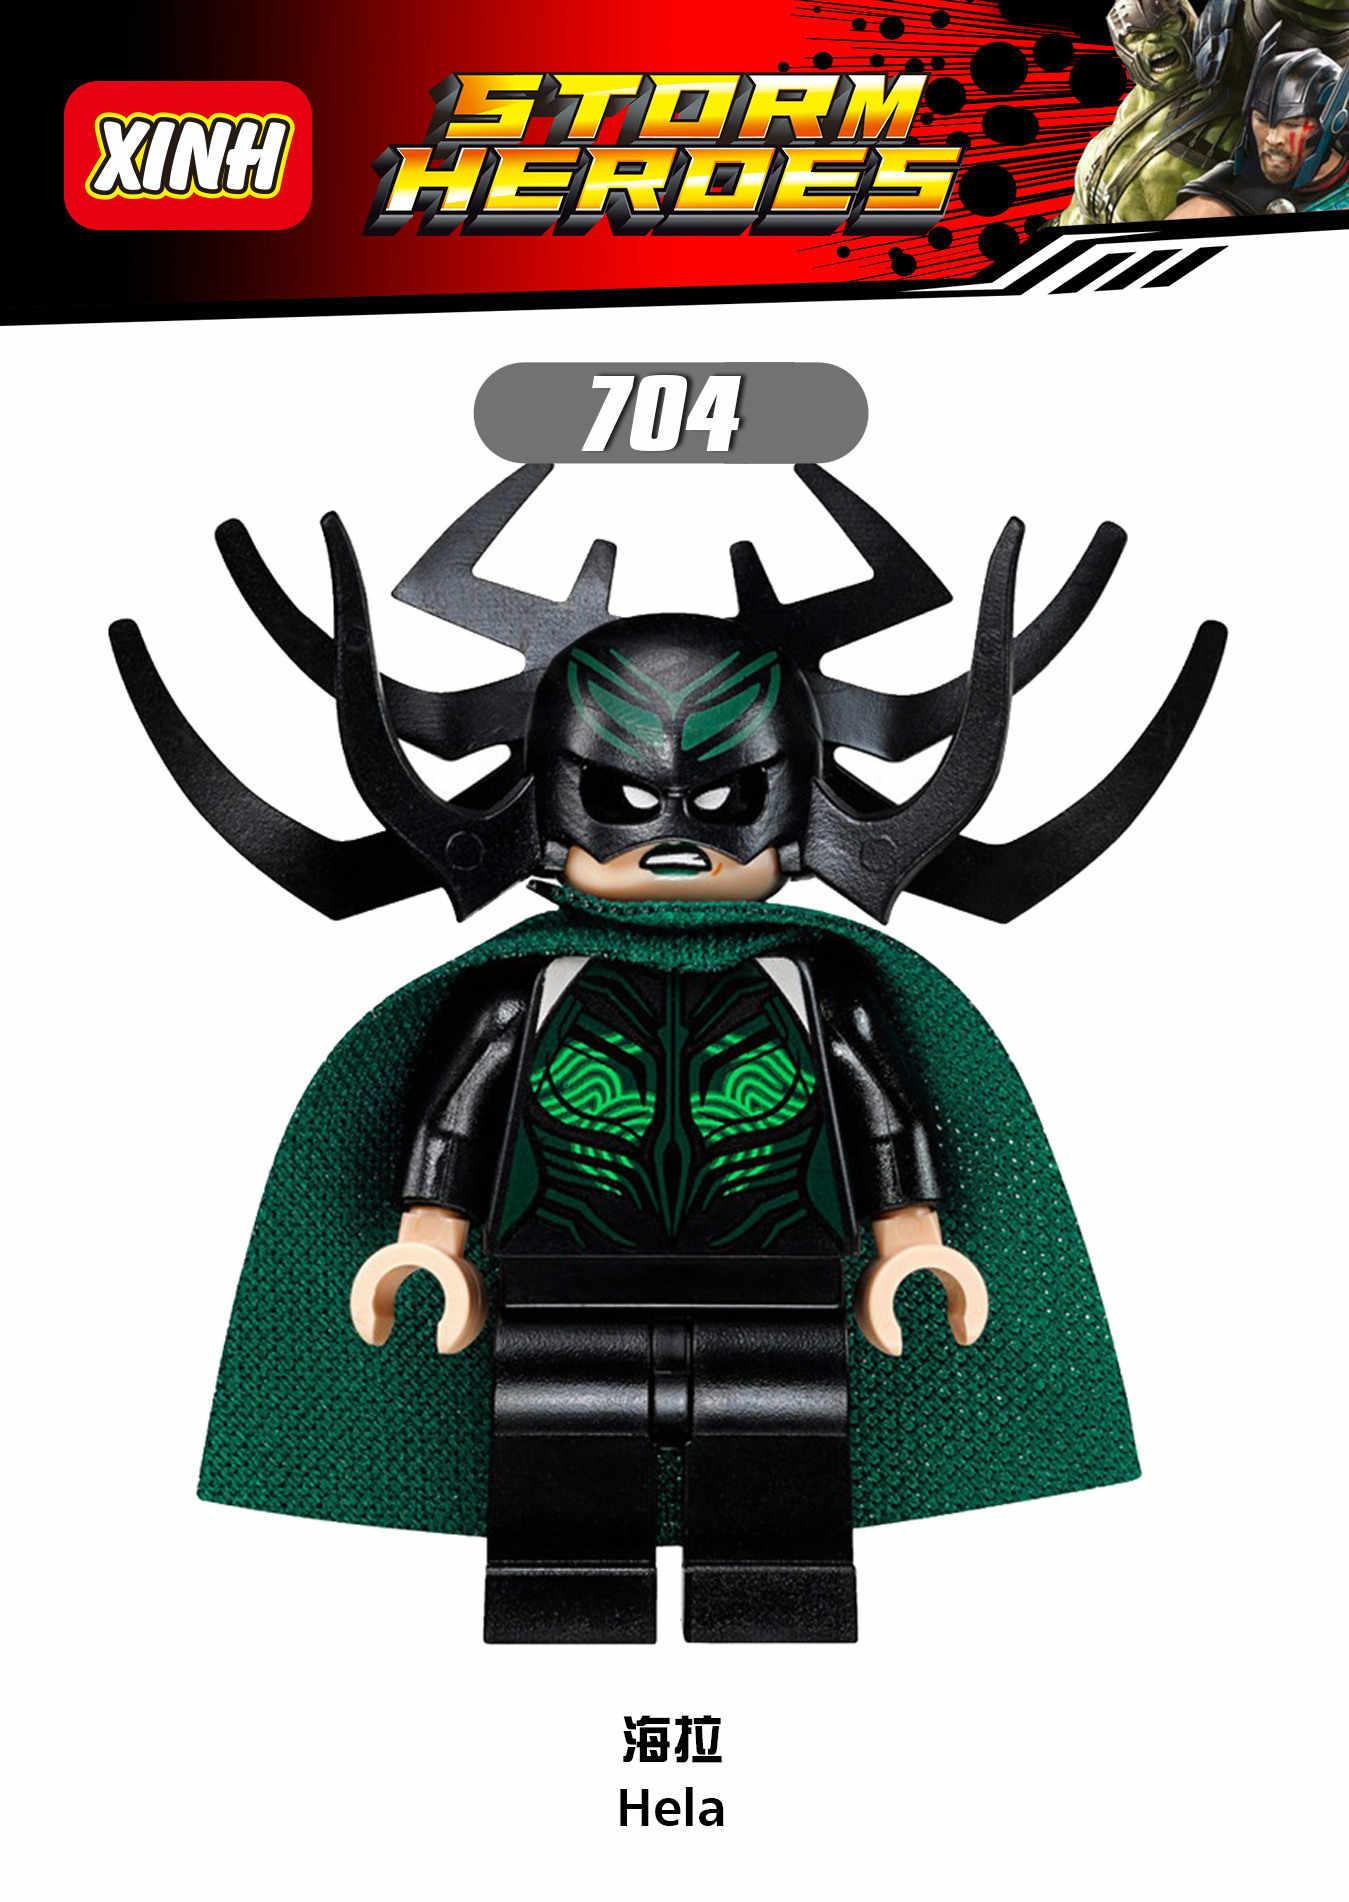 Marvel Super Heroes Racing Hela Thor Bruce Banner Berserker Valky Legoed Building Blocks Action Figures Giocattoli Per I Bambini